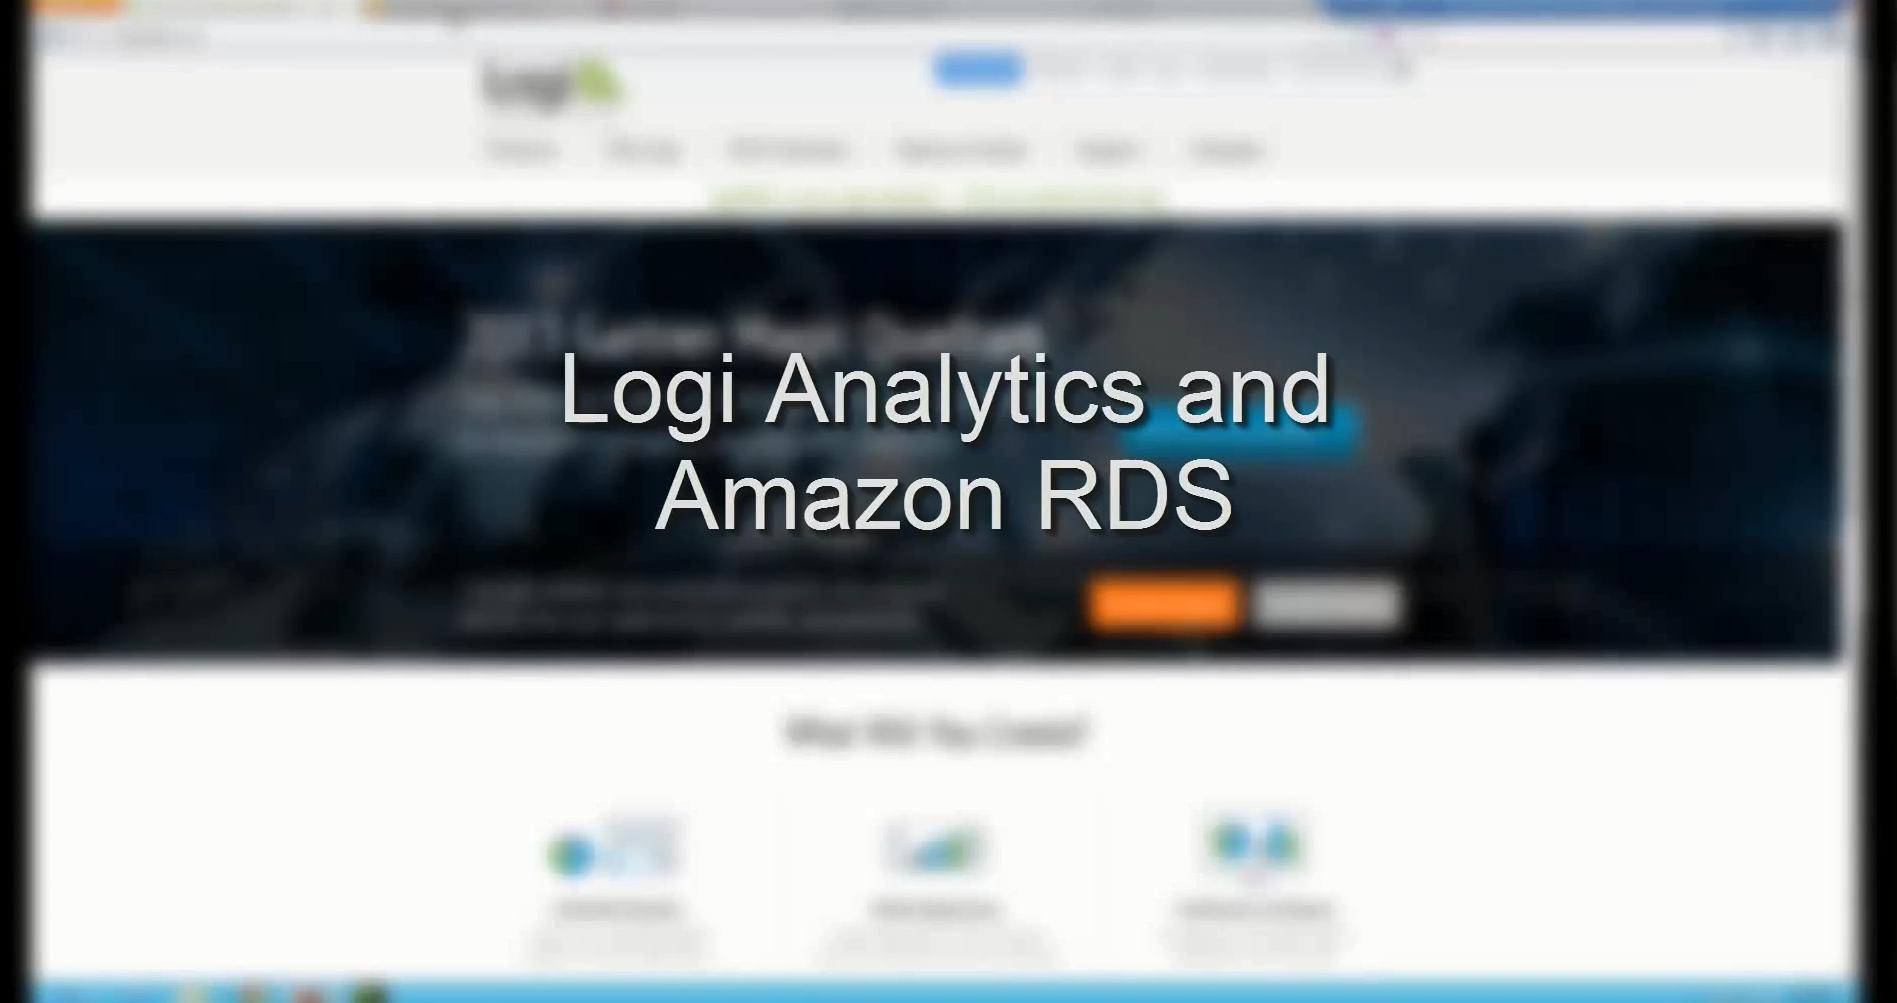 apn amazon rds partners logi analytics